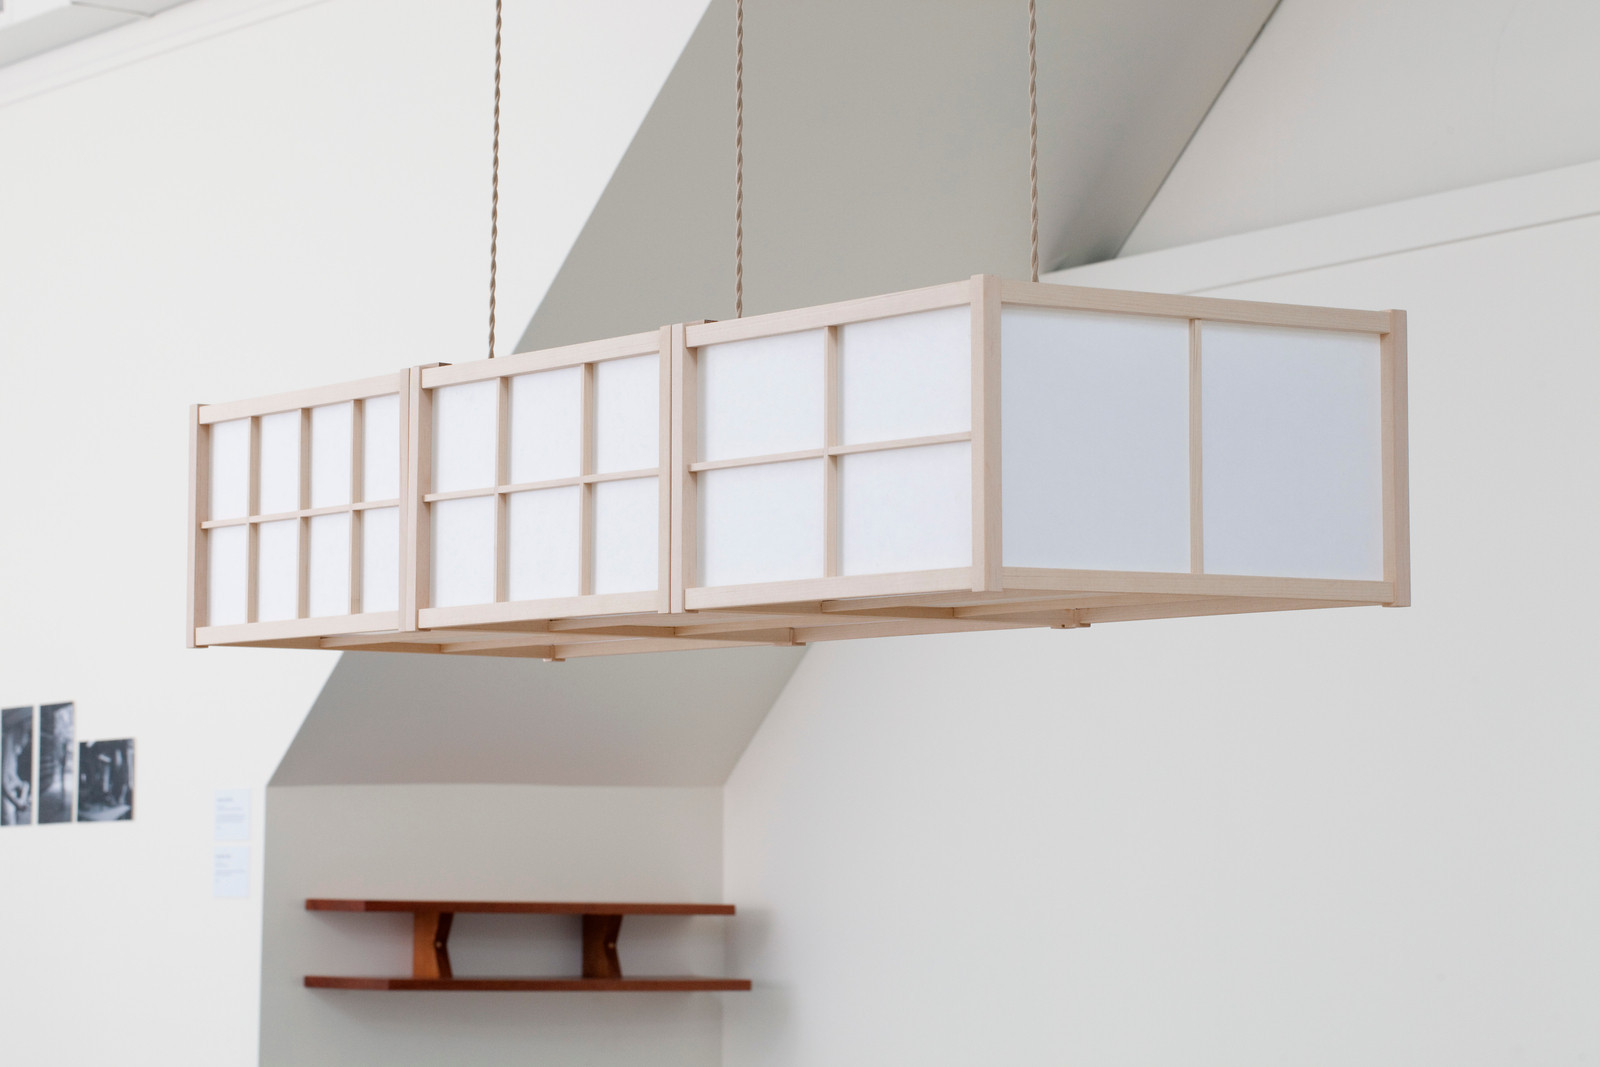 Moderne Gallery_12-X3_0.jpg